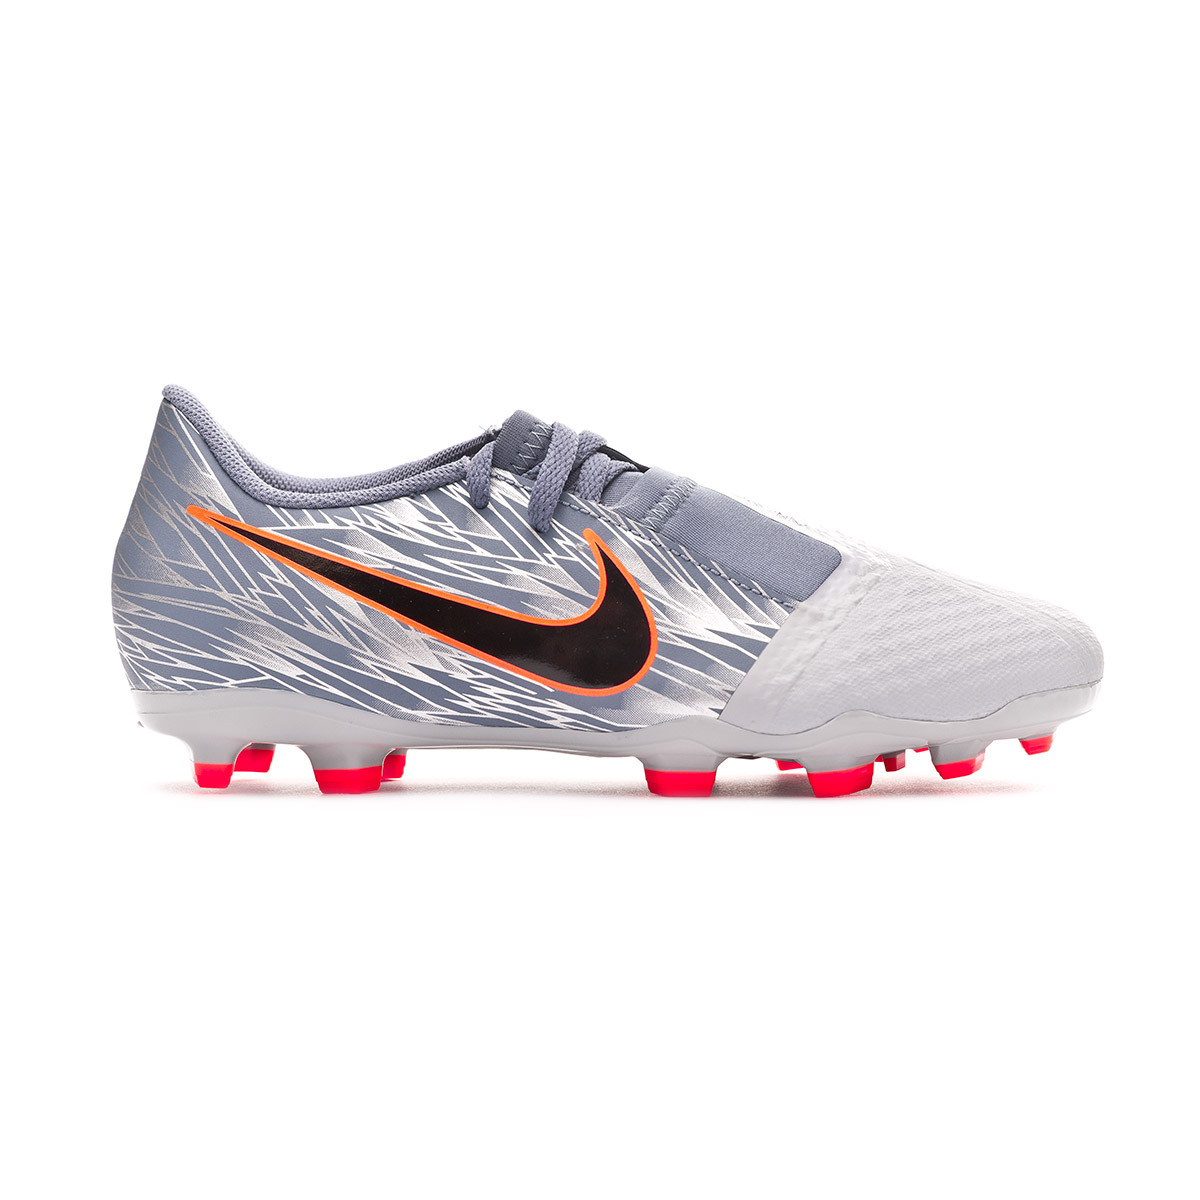 63371fb78 Football Boots Nike Kids Phantom Venom Academy FG Wolf grey-Black-Armory  blue - Football store Fútbol Emotion